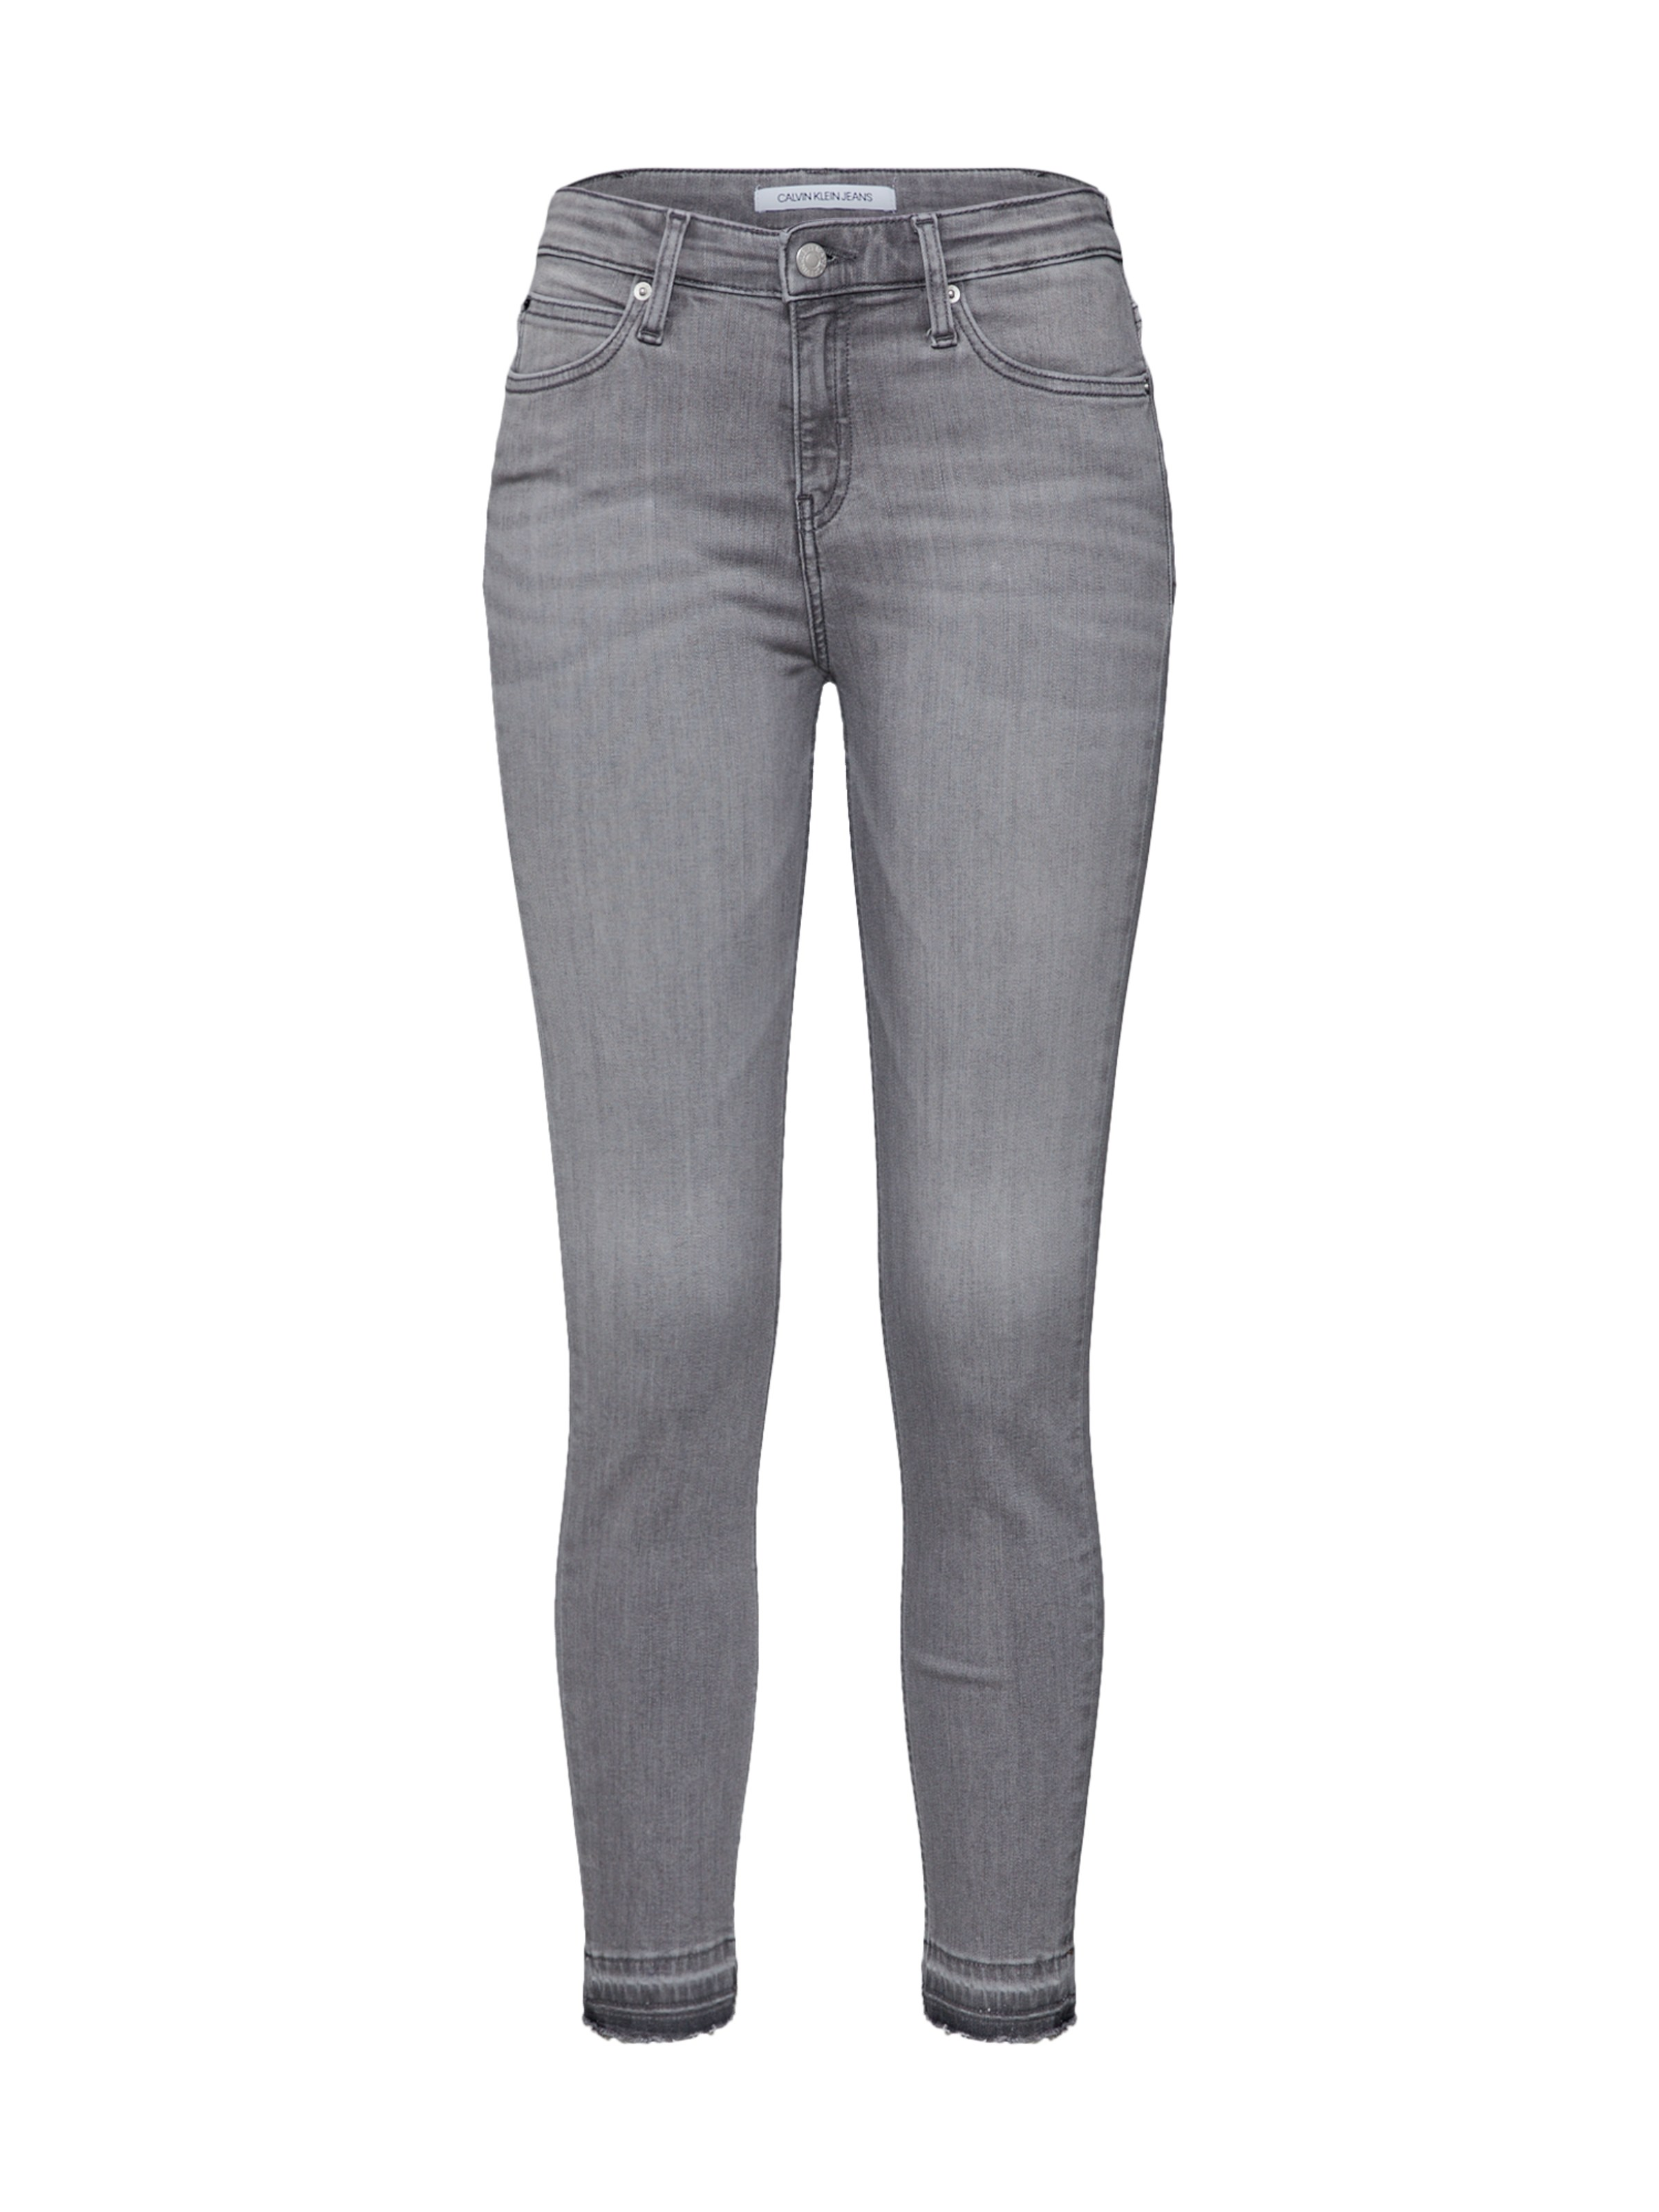 35fad887eaf4 Calvin Klein Jeans Džíny  CKJ 011 MID RISE SKINNY  šedá džínová ...